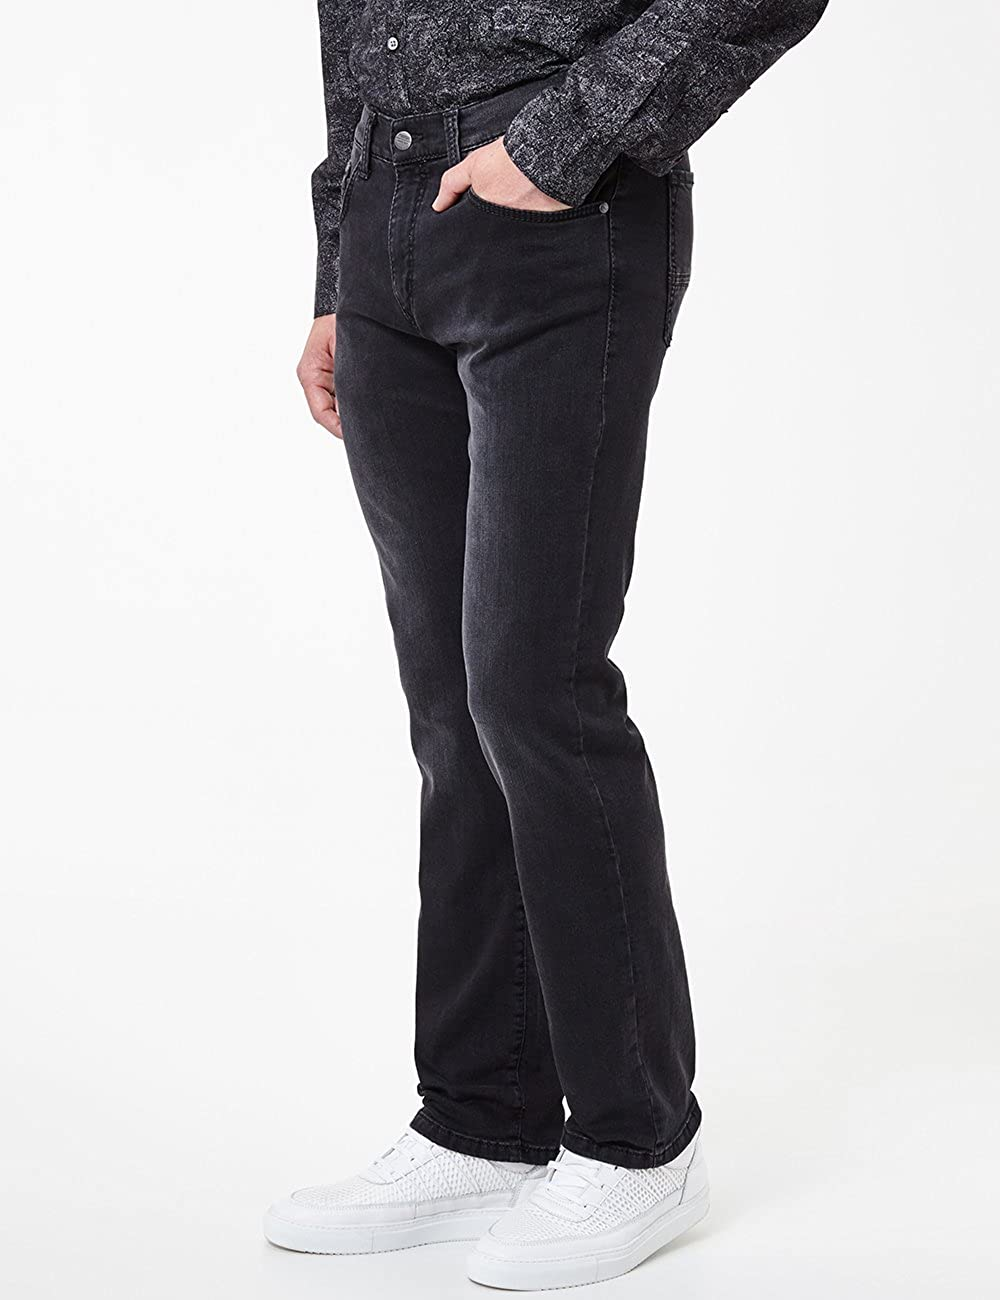 Pioneer Rando Megaflex Pantalon Homme Bleu (Dark Used 14).